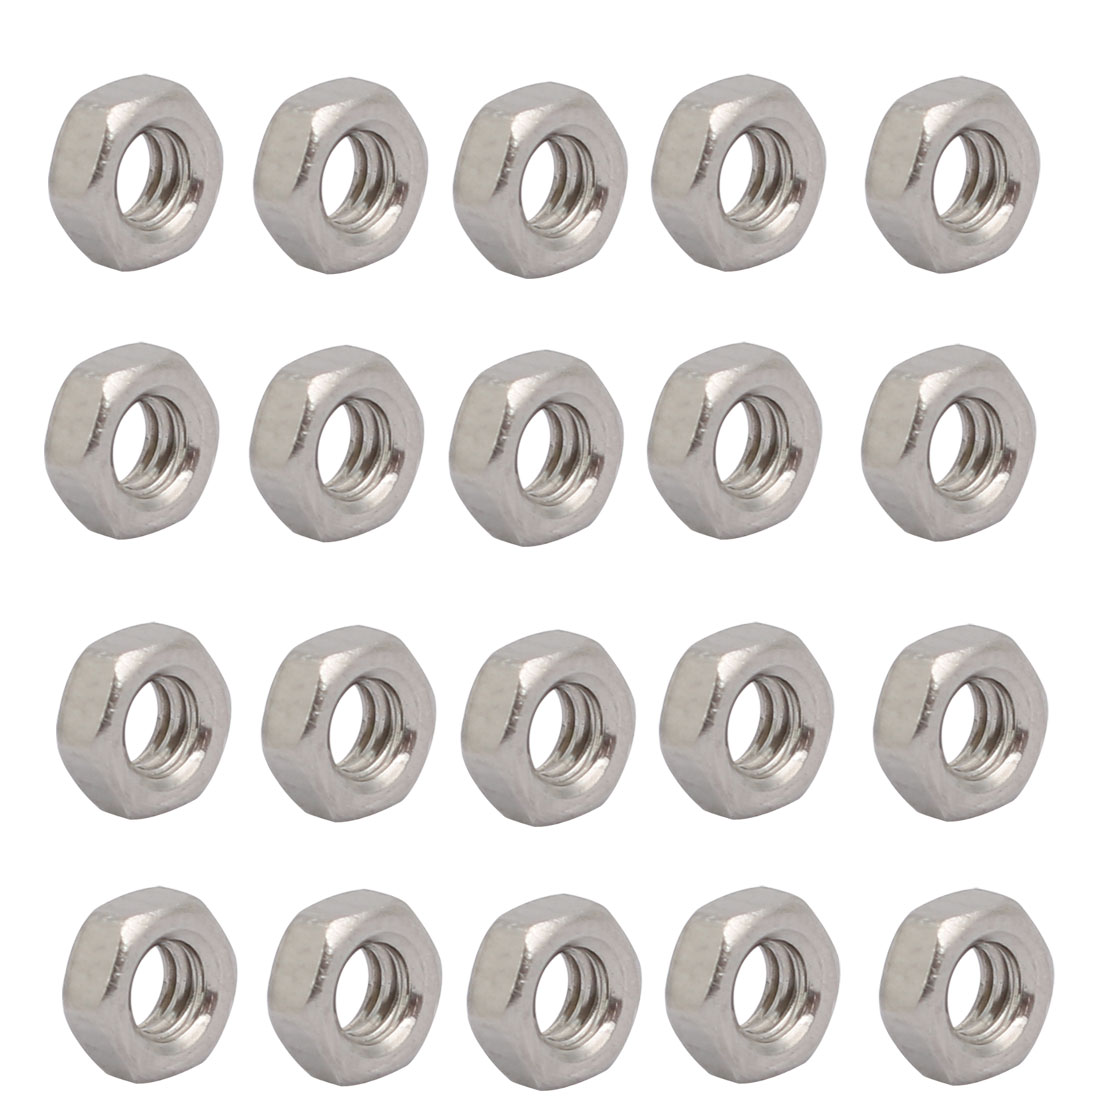 "20pcs 1/8""-40 BSW Thread 304 Stainless Steel Hex Nut Fastener Silver Tone"